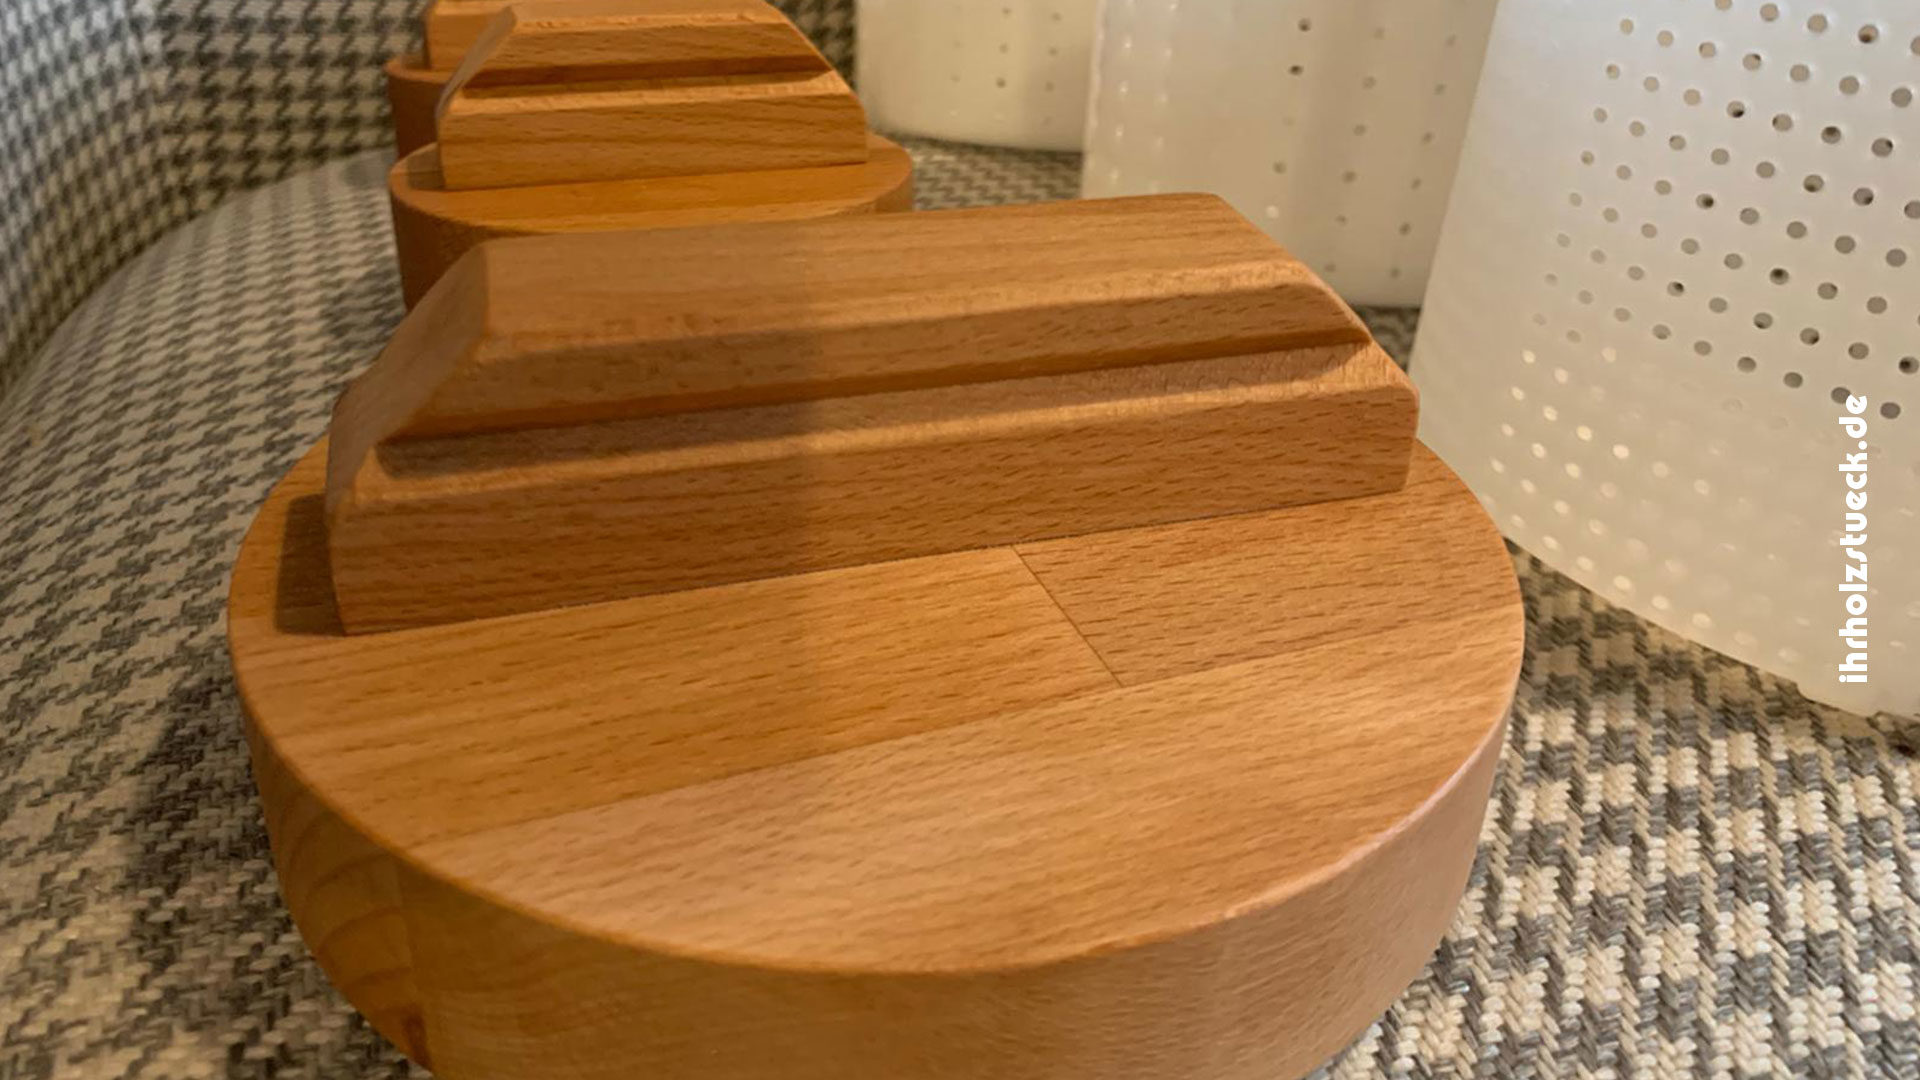 Stempel für Käseformen aus Echtholz